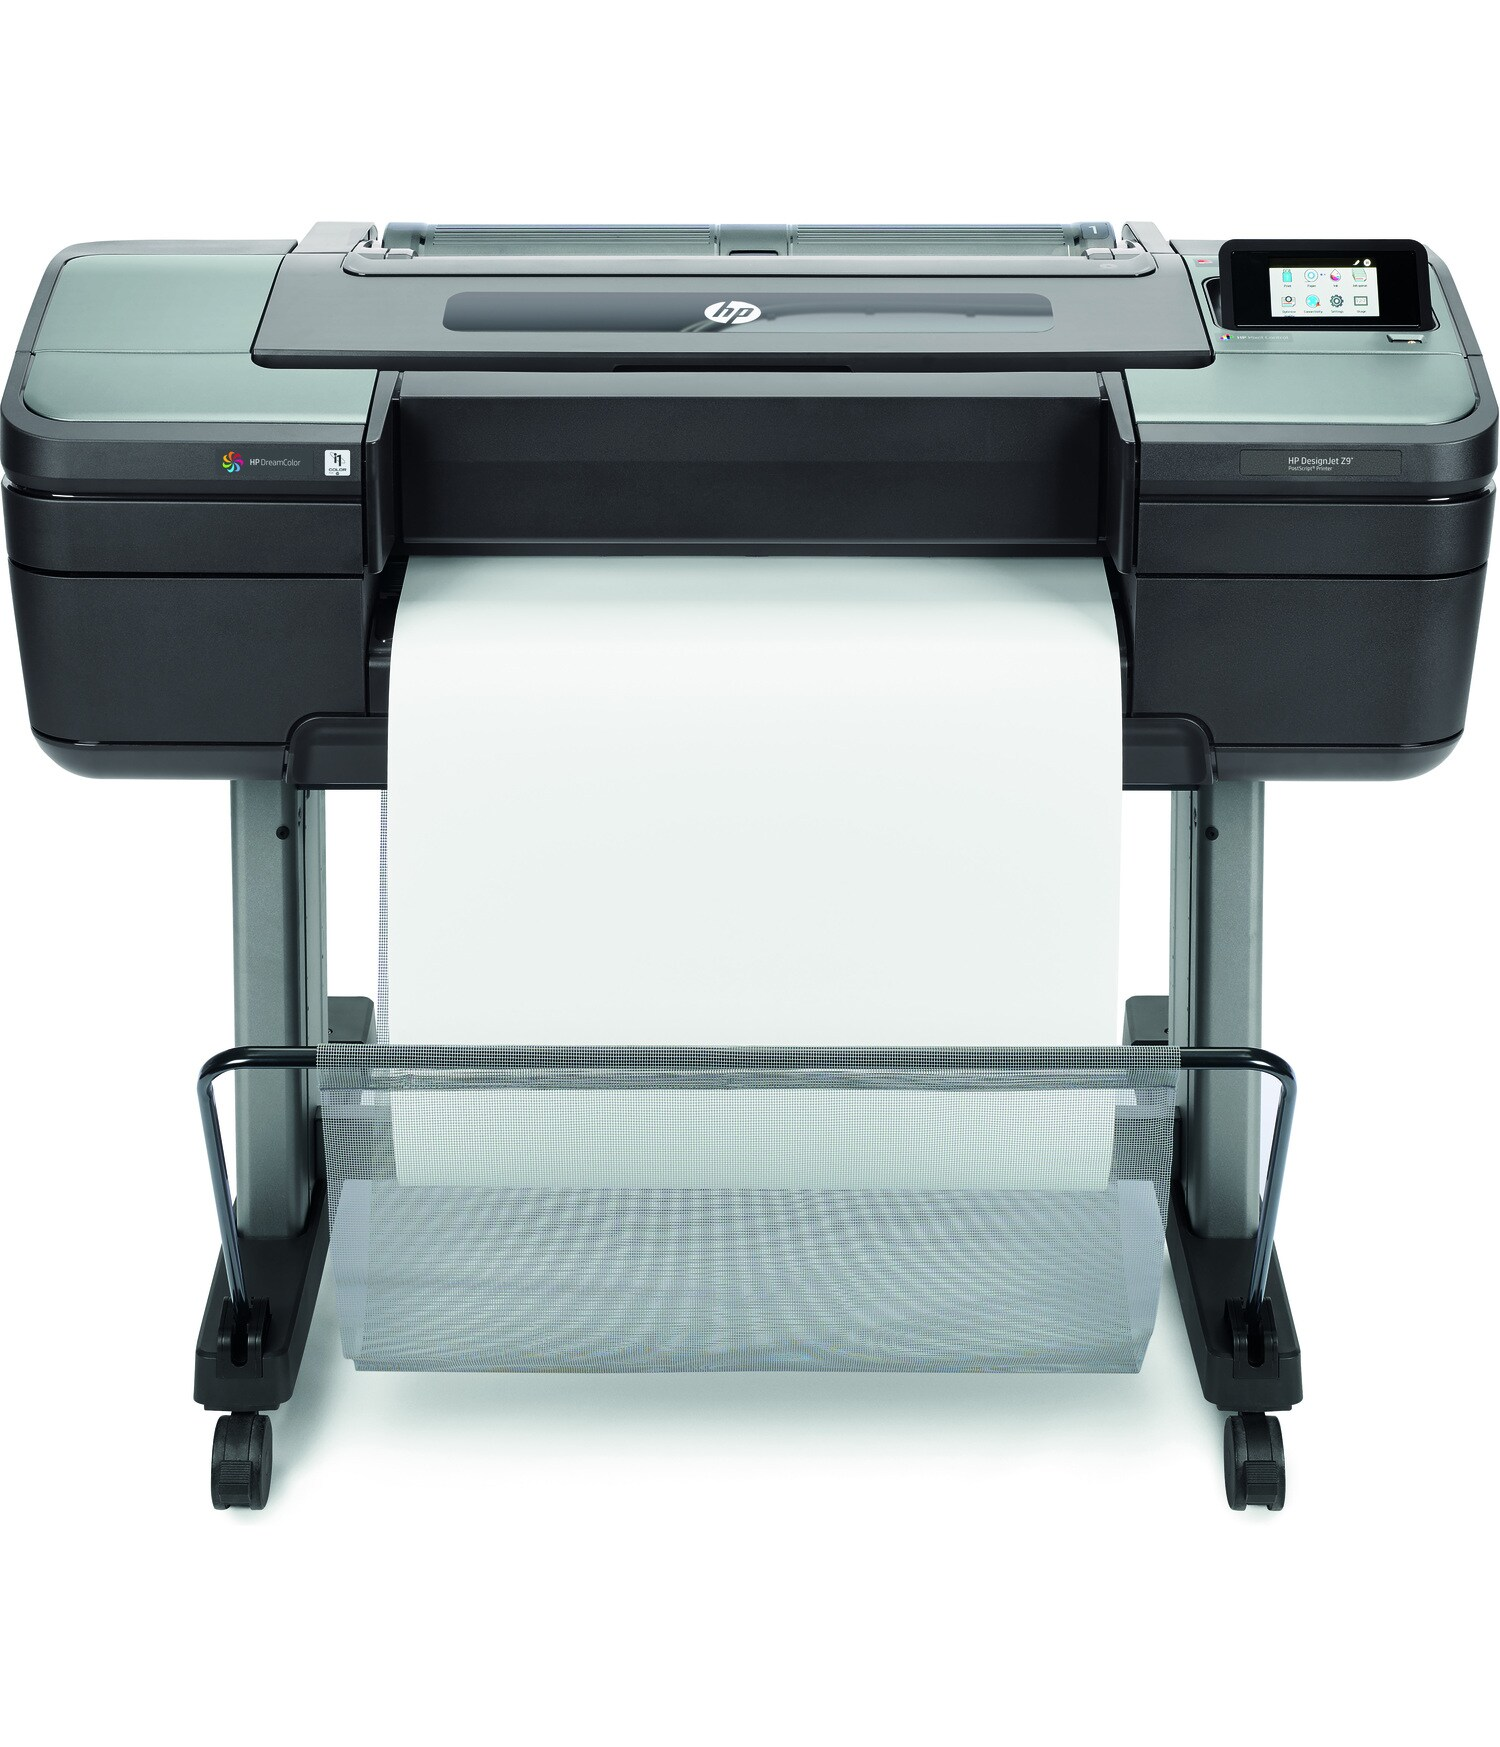 Impressora Plotter Designjet Z9Dr 44 Polegadas PostScript X9D24A HP 26333